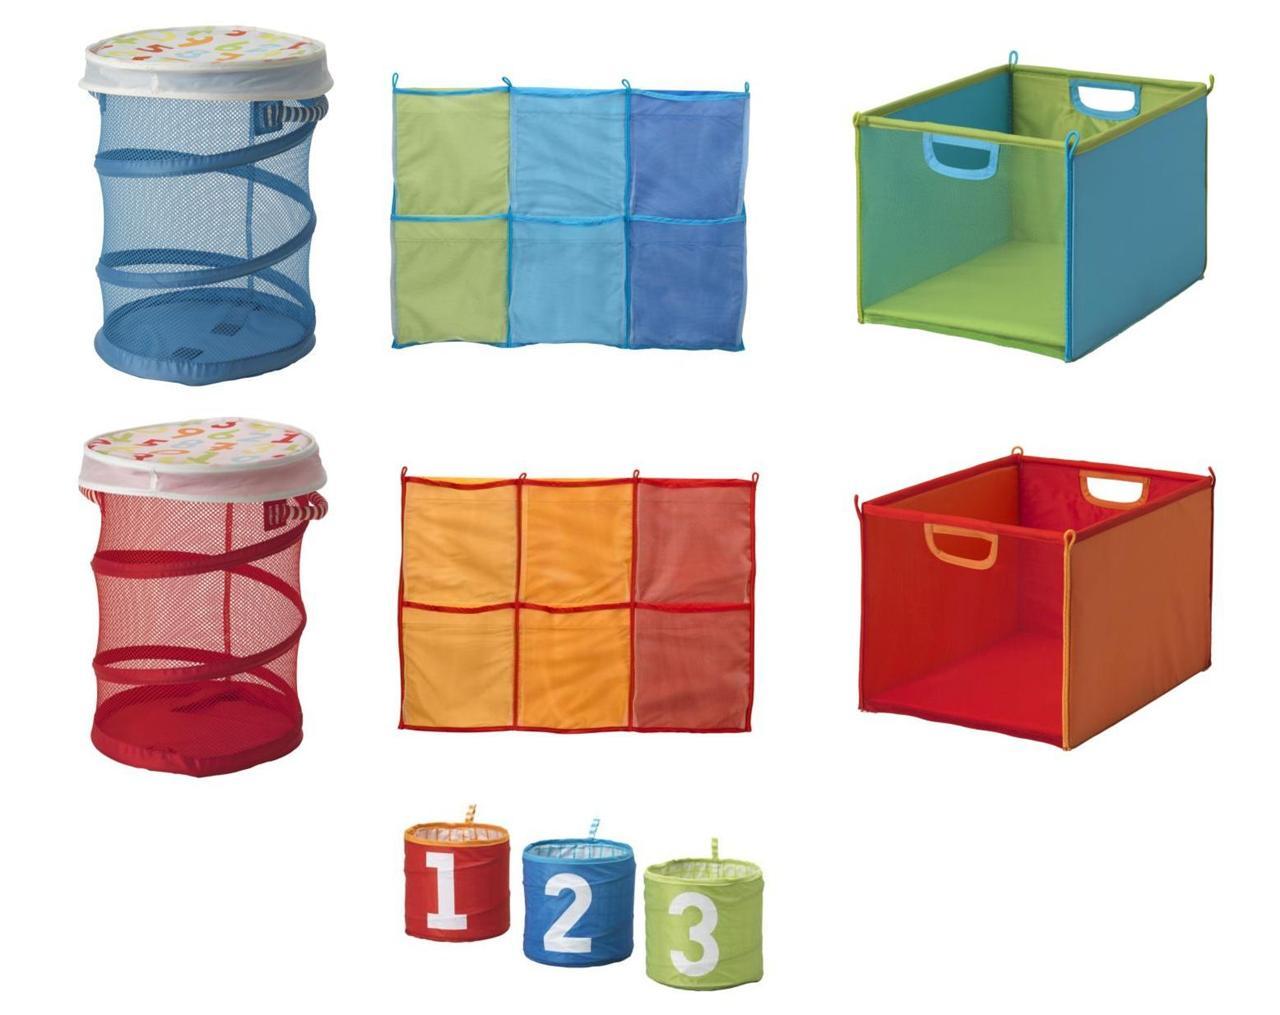 "Childrens Kids Bedroom Furniture Set Toy Chest Boxes Ikea: Ikea Kids Children's ""Kusiner"" STORAGE BASKETS, BOXES"